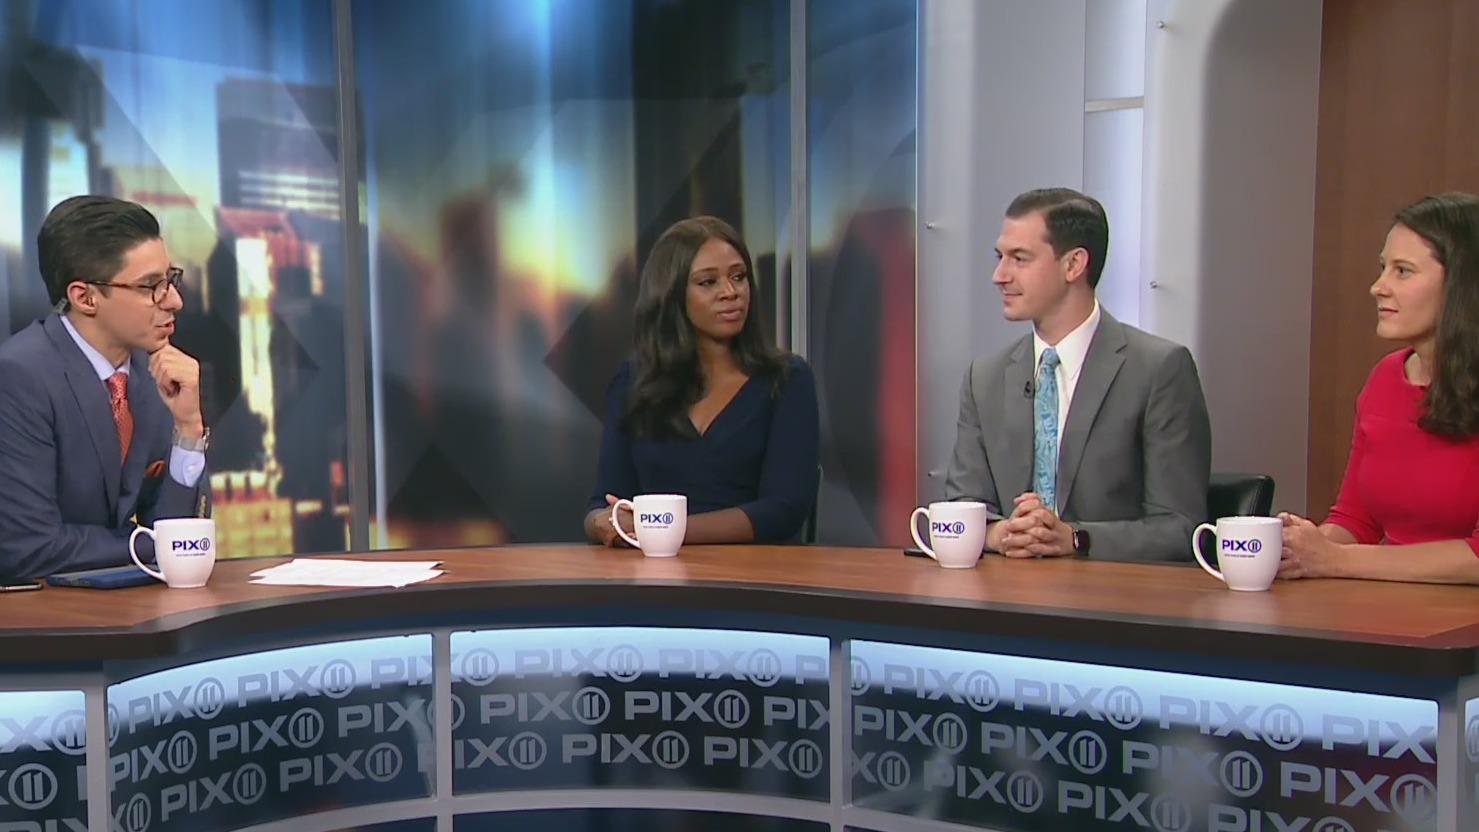 PIX on Politics panel